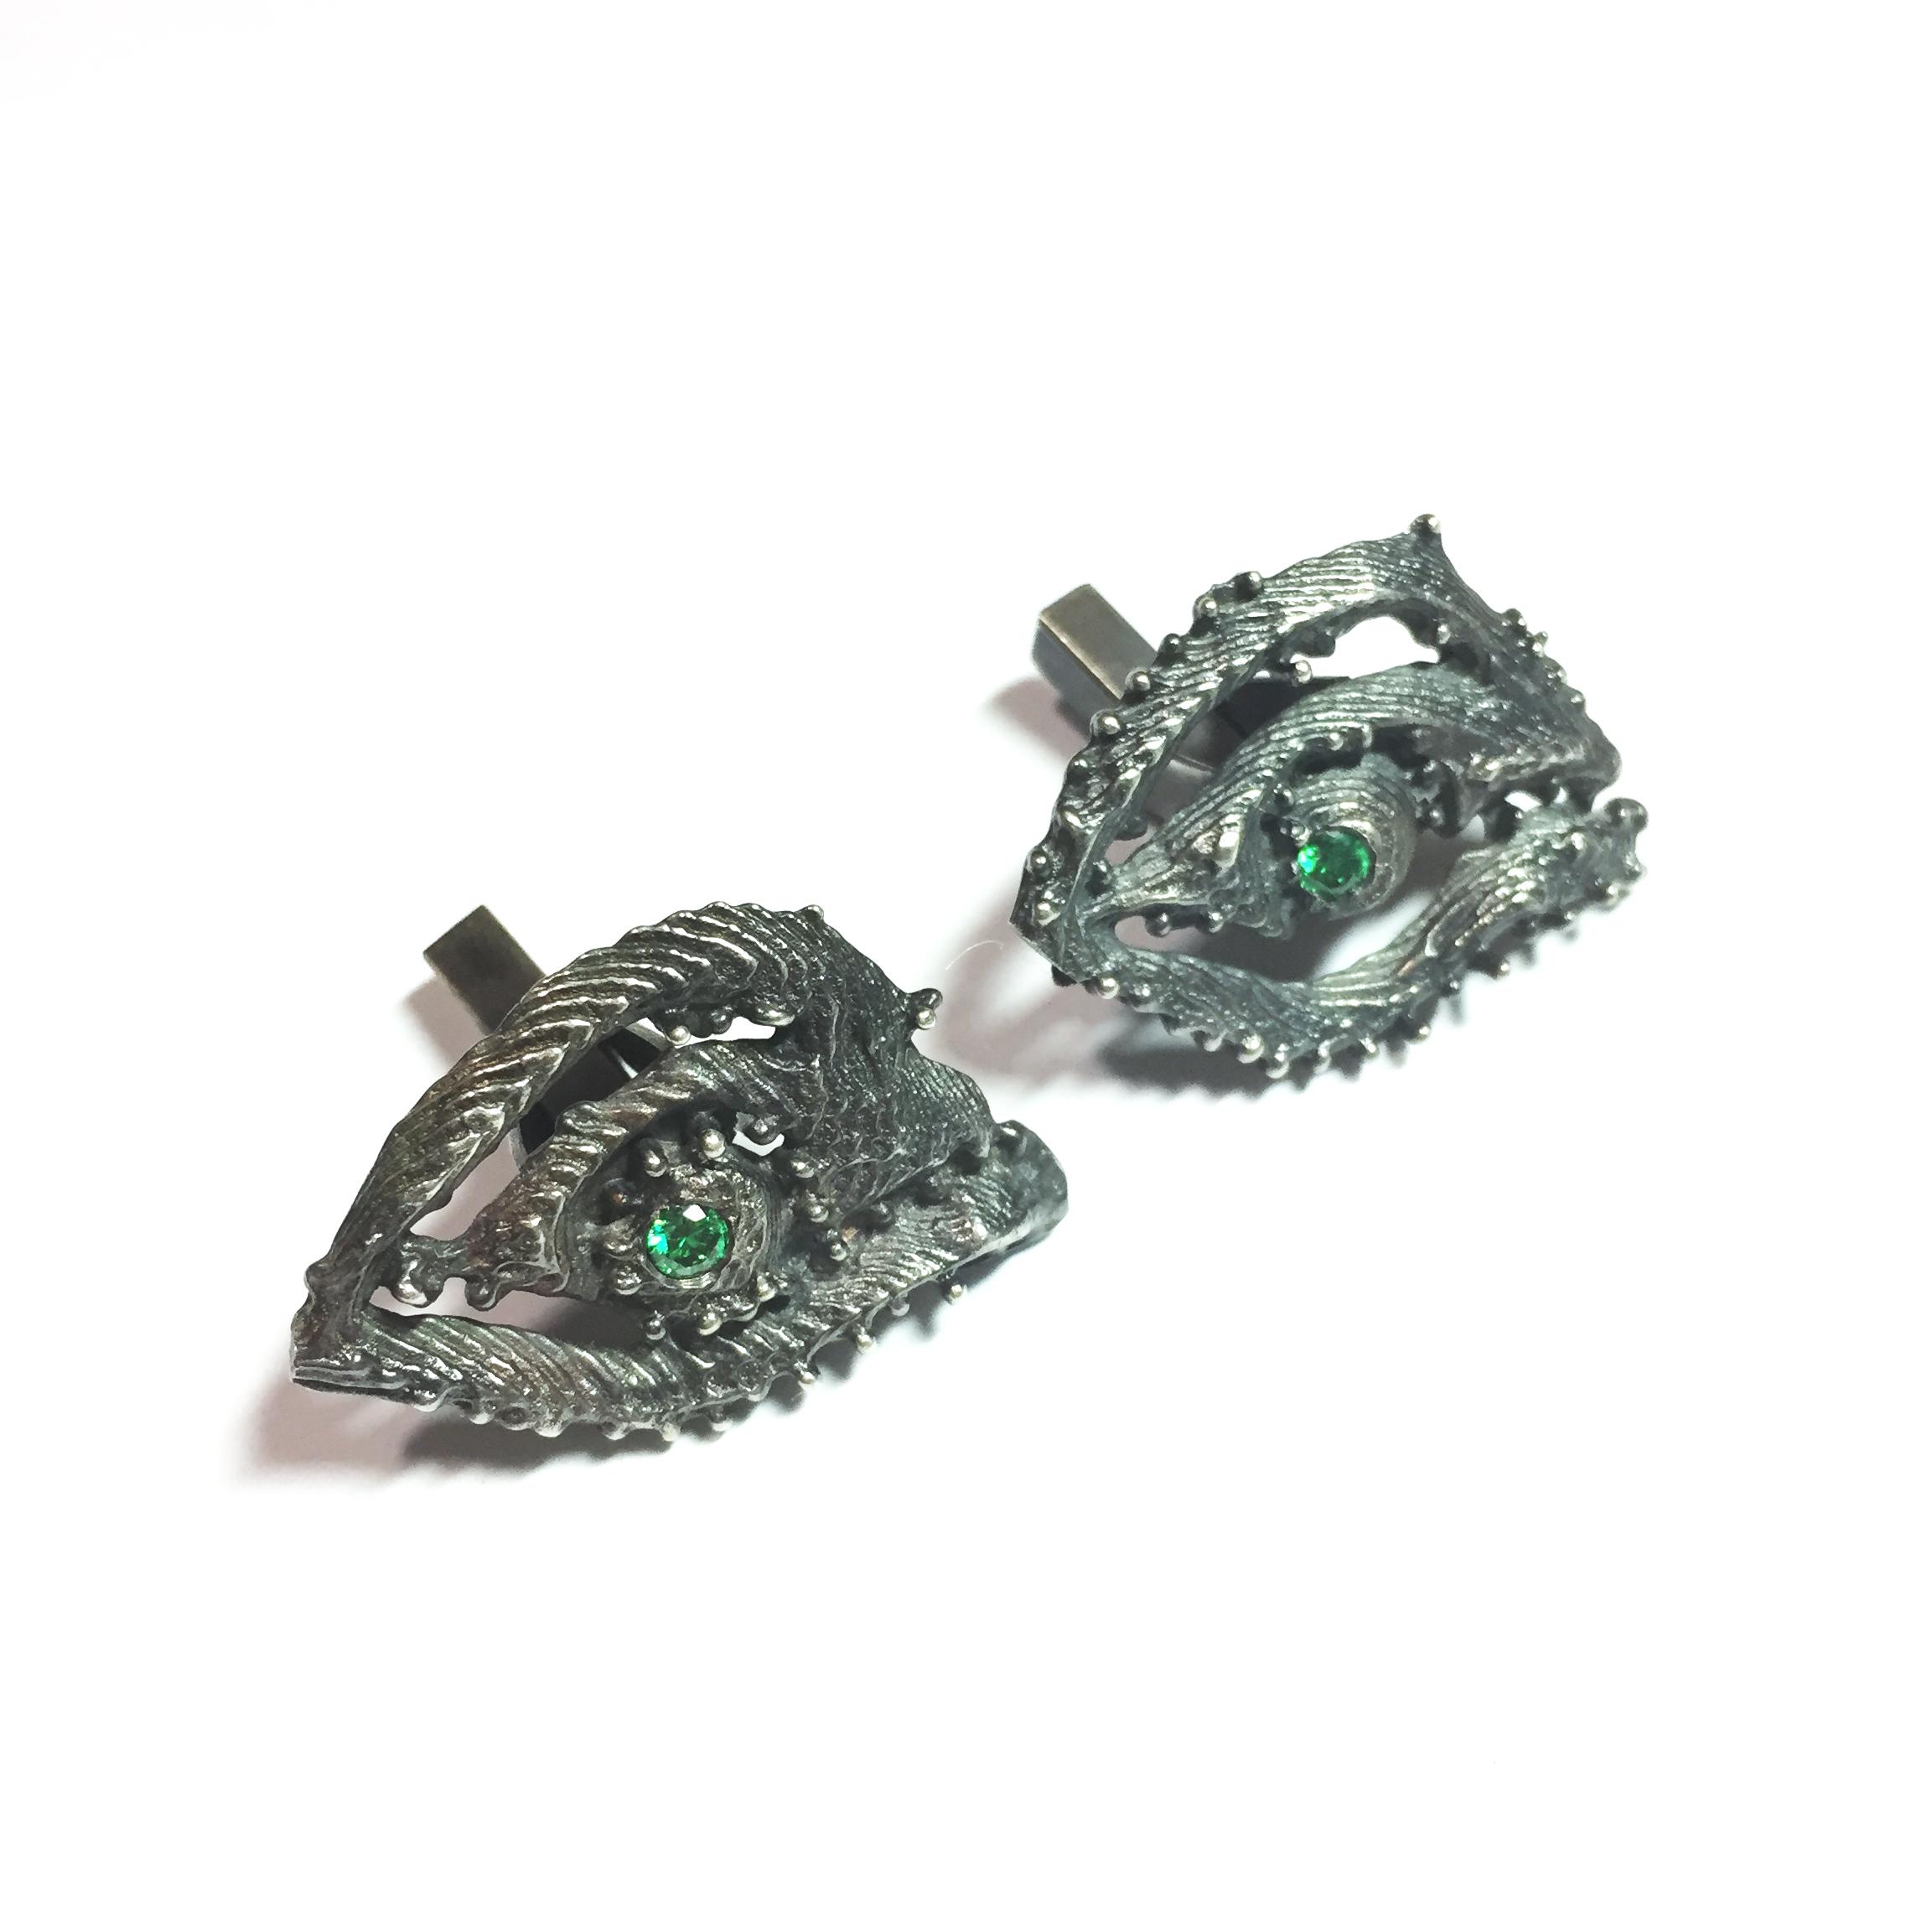 Chameleon Cufflinks